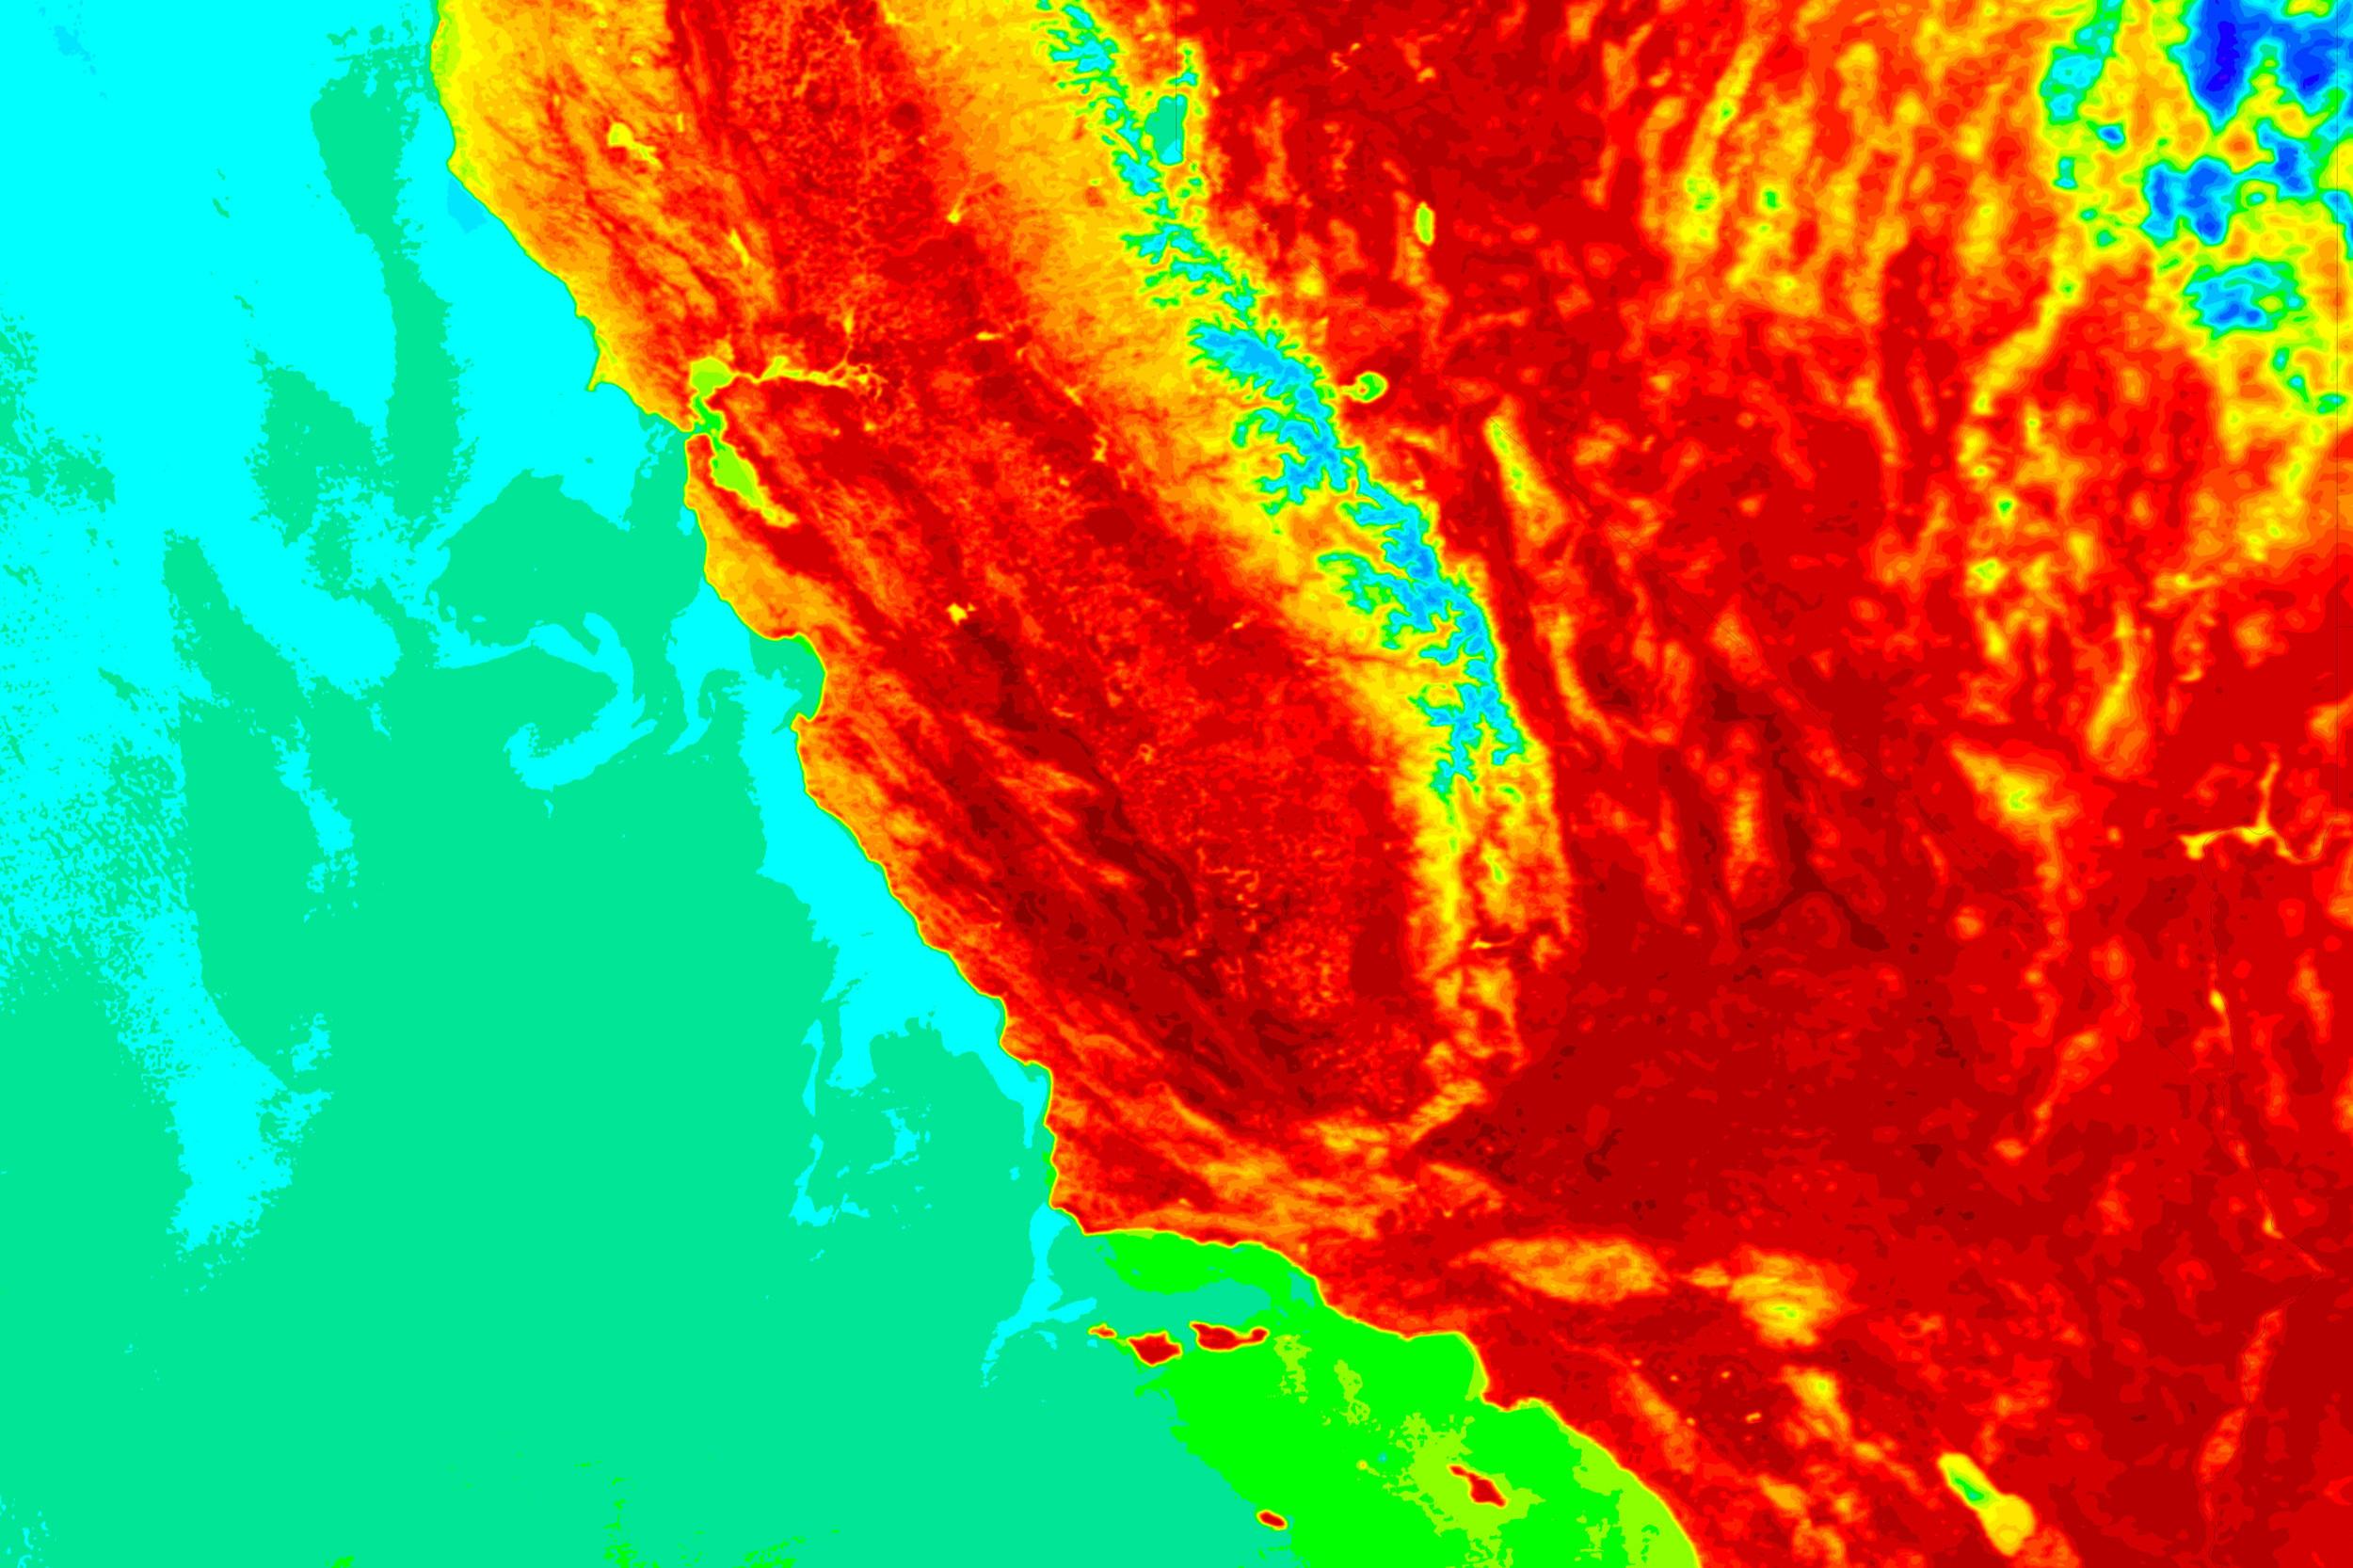 P3.California_heat_AMO2004123_lrg.jpg